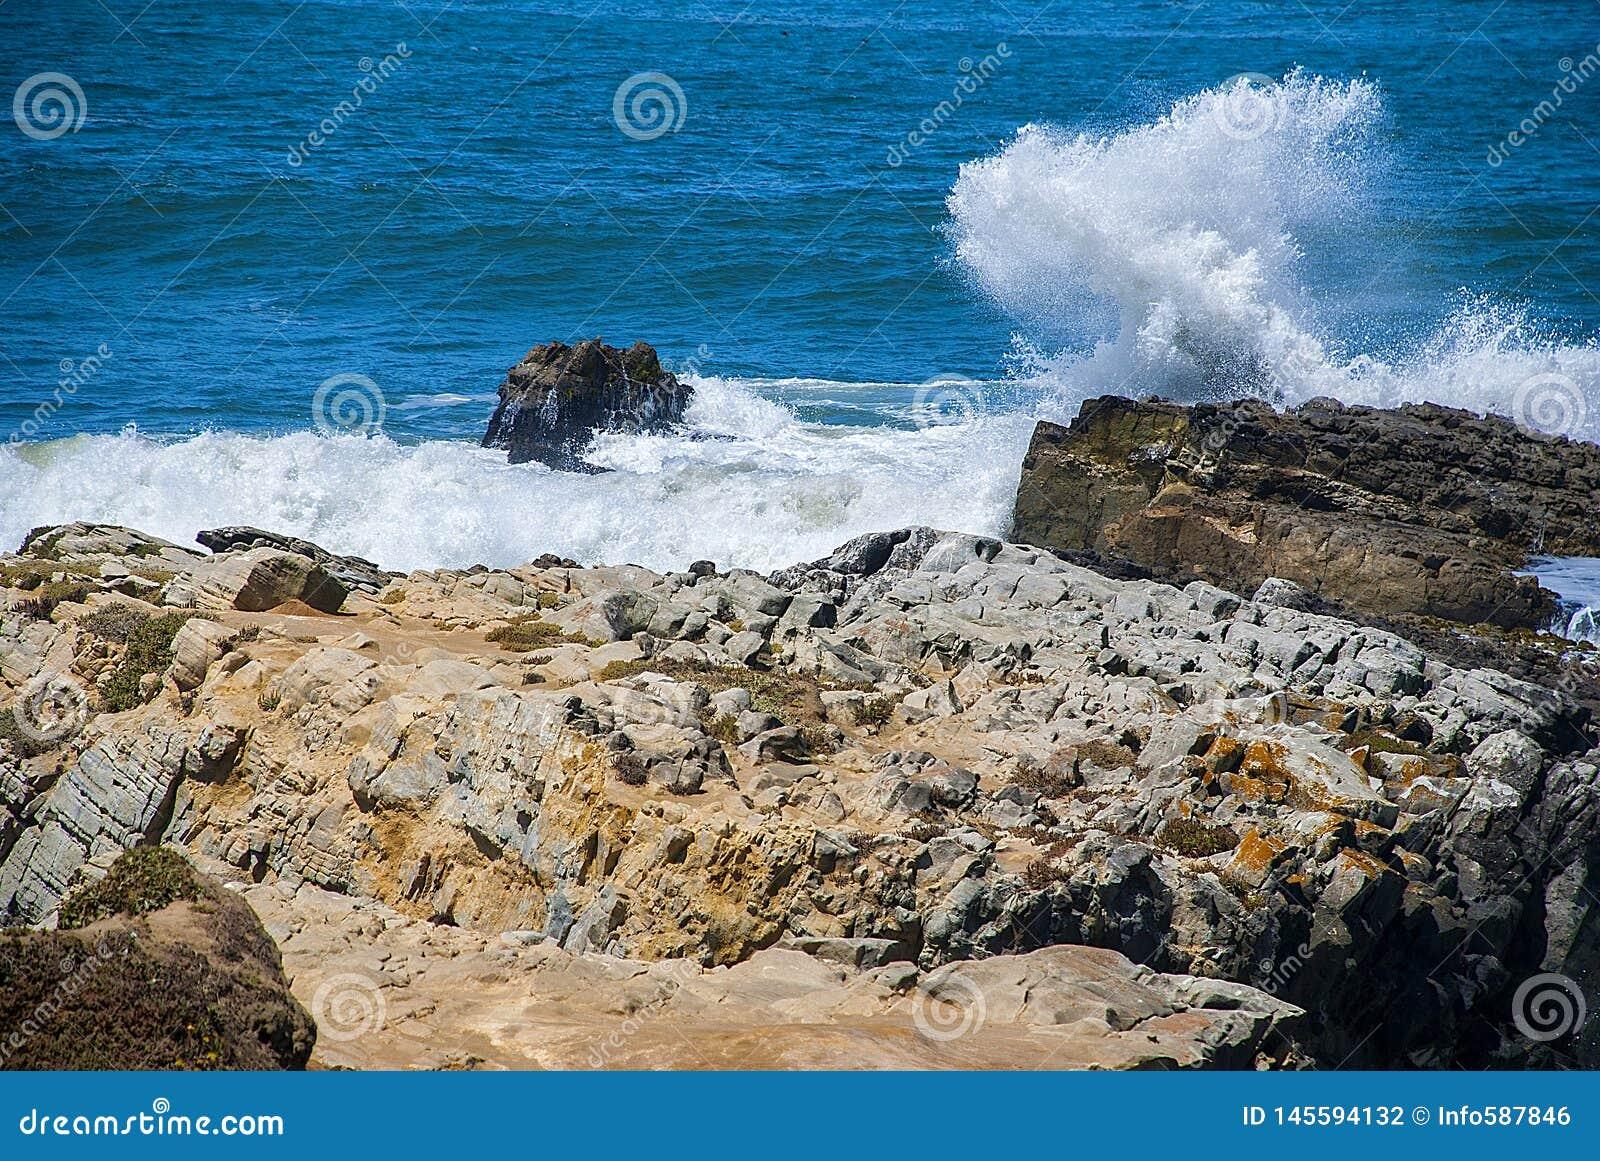 Vagues se brisantes, océan bleu atlantique